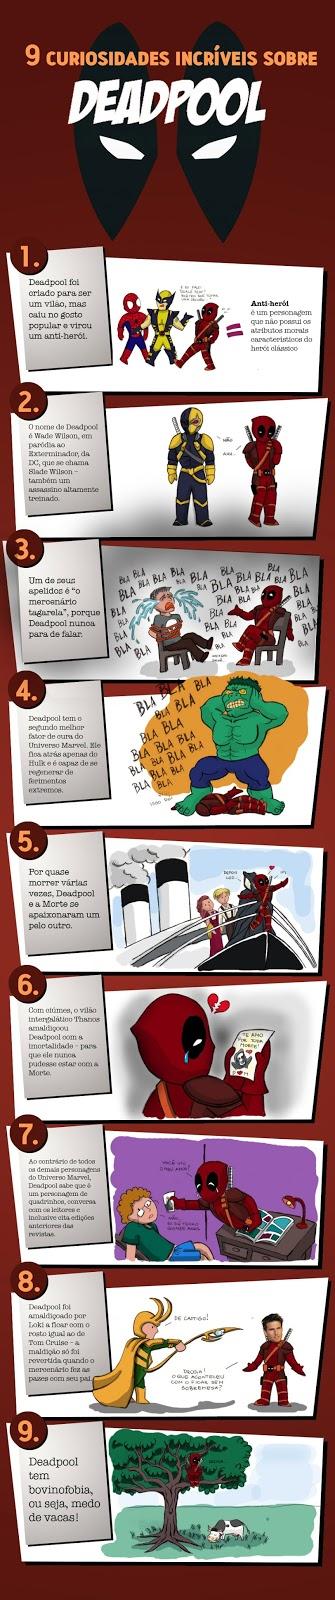 9 Curiosidades sobre Deadpool